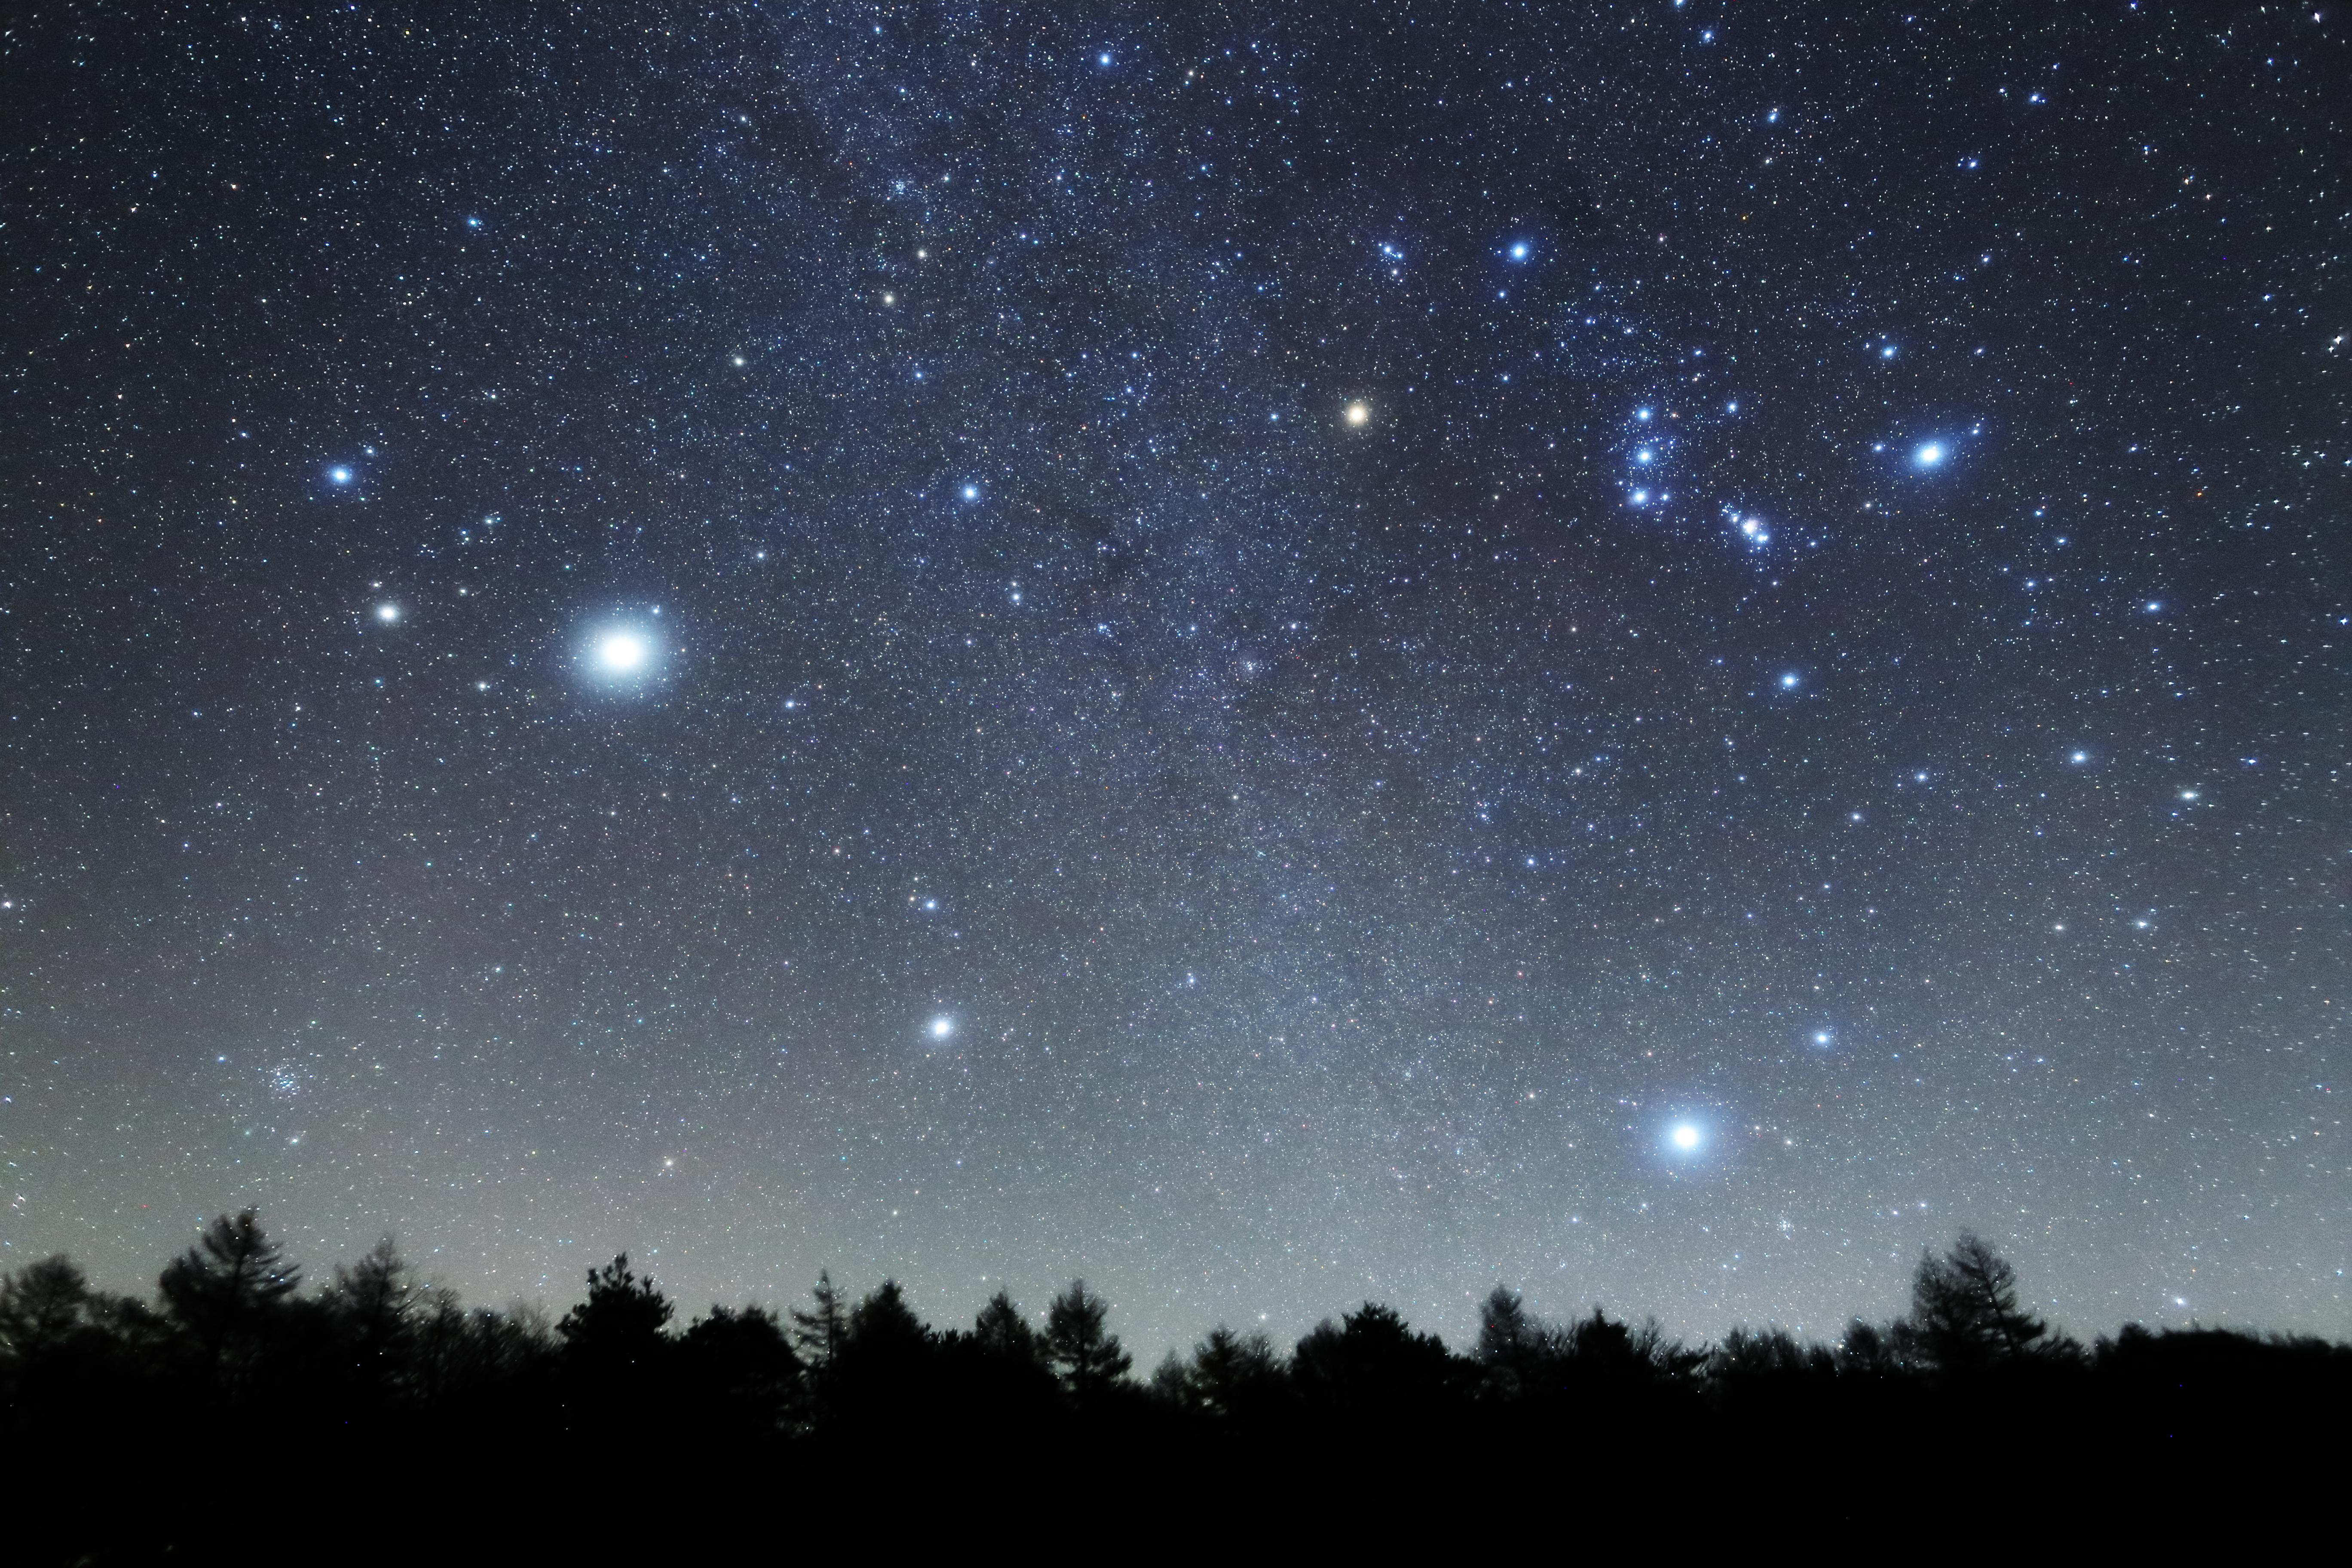 "<b class="""">ソフトフィルターの効果</b><br class="""">左がソフトフィルターあり、右がソフトフィルターなし。東の空に昇ってきたオリオン座と冬の大三角。ふたご座の明るい星は木星です。画面中央を斜めに淡い冬の天の川が流れています。<br class="""">EOS 6D / EF 24mm F1.4L II USM / F2.5 / 30秒 / ISO3200 / 追尾撮影"